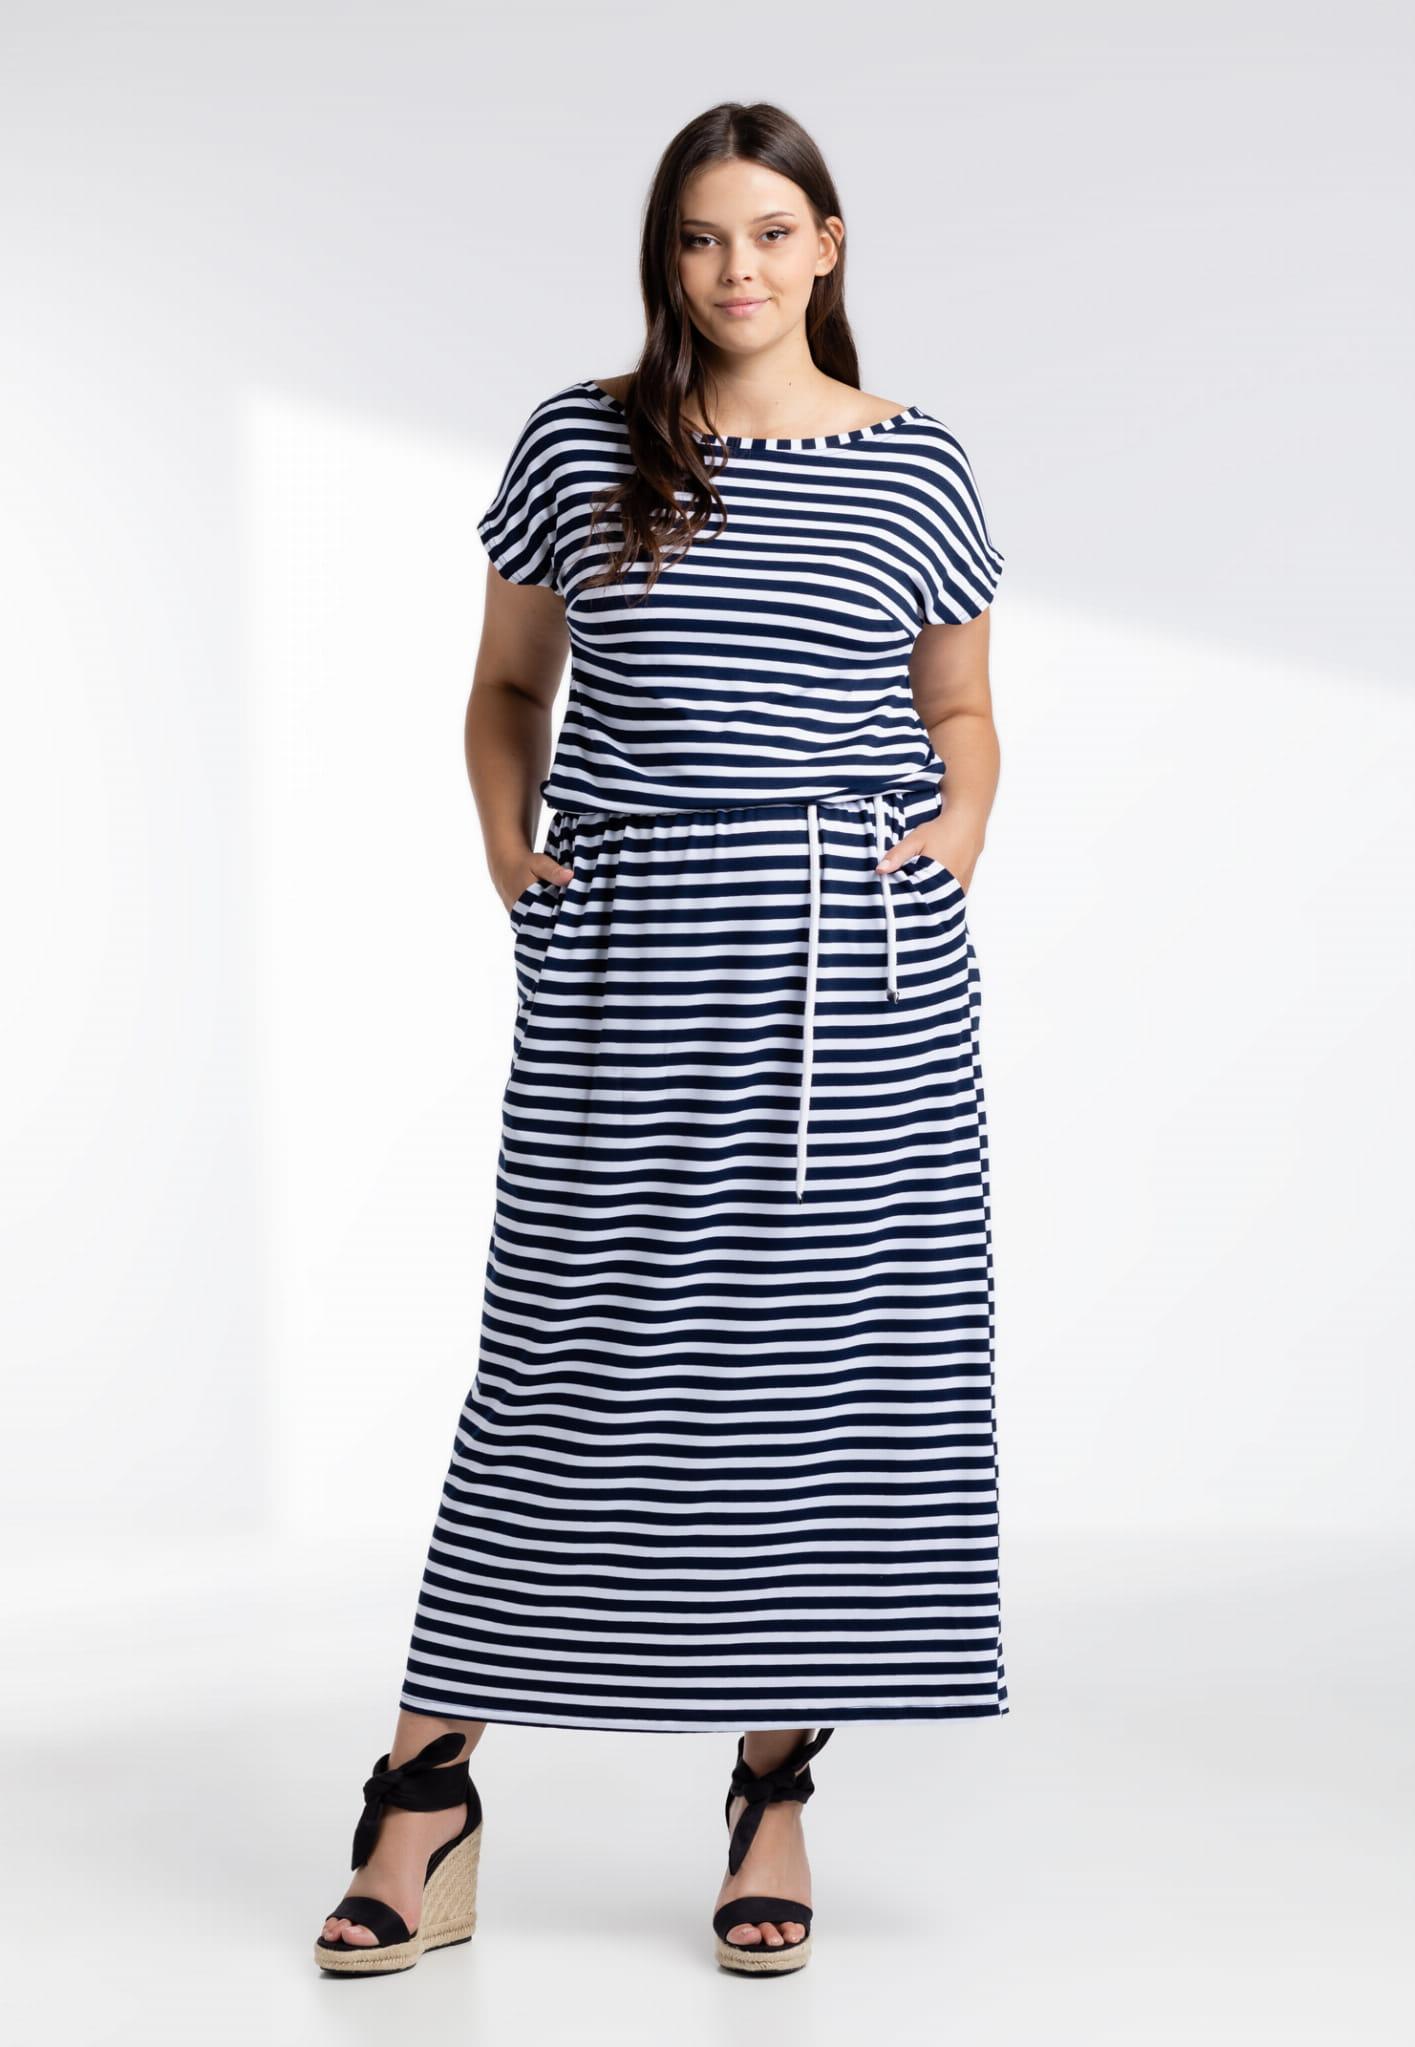 Sukienka Sukienka Susana maxi w granatowe paski XXL OVERSIZE LATO